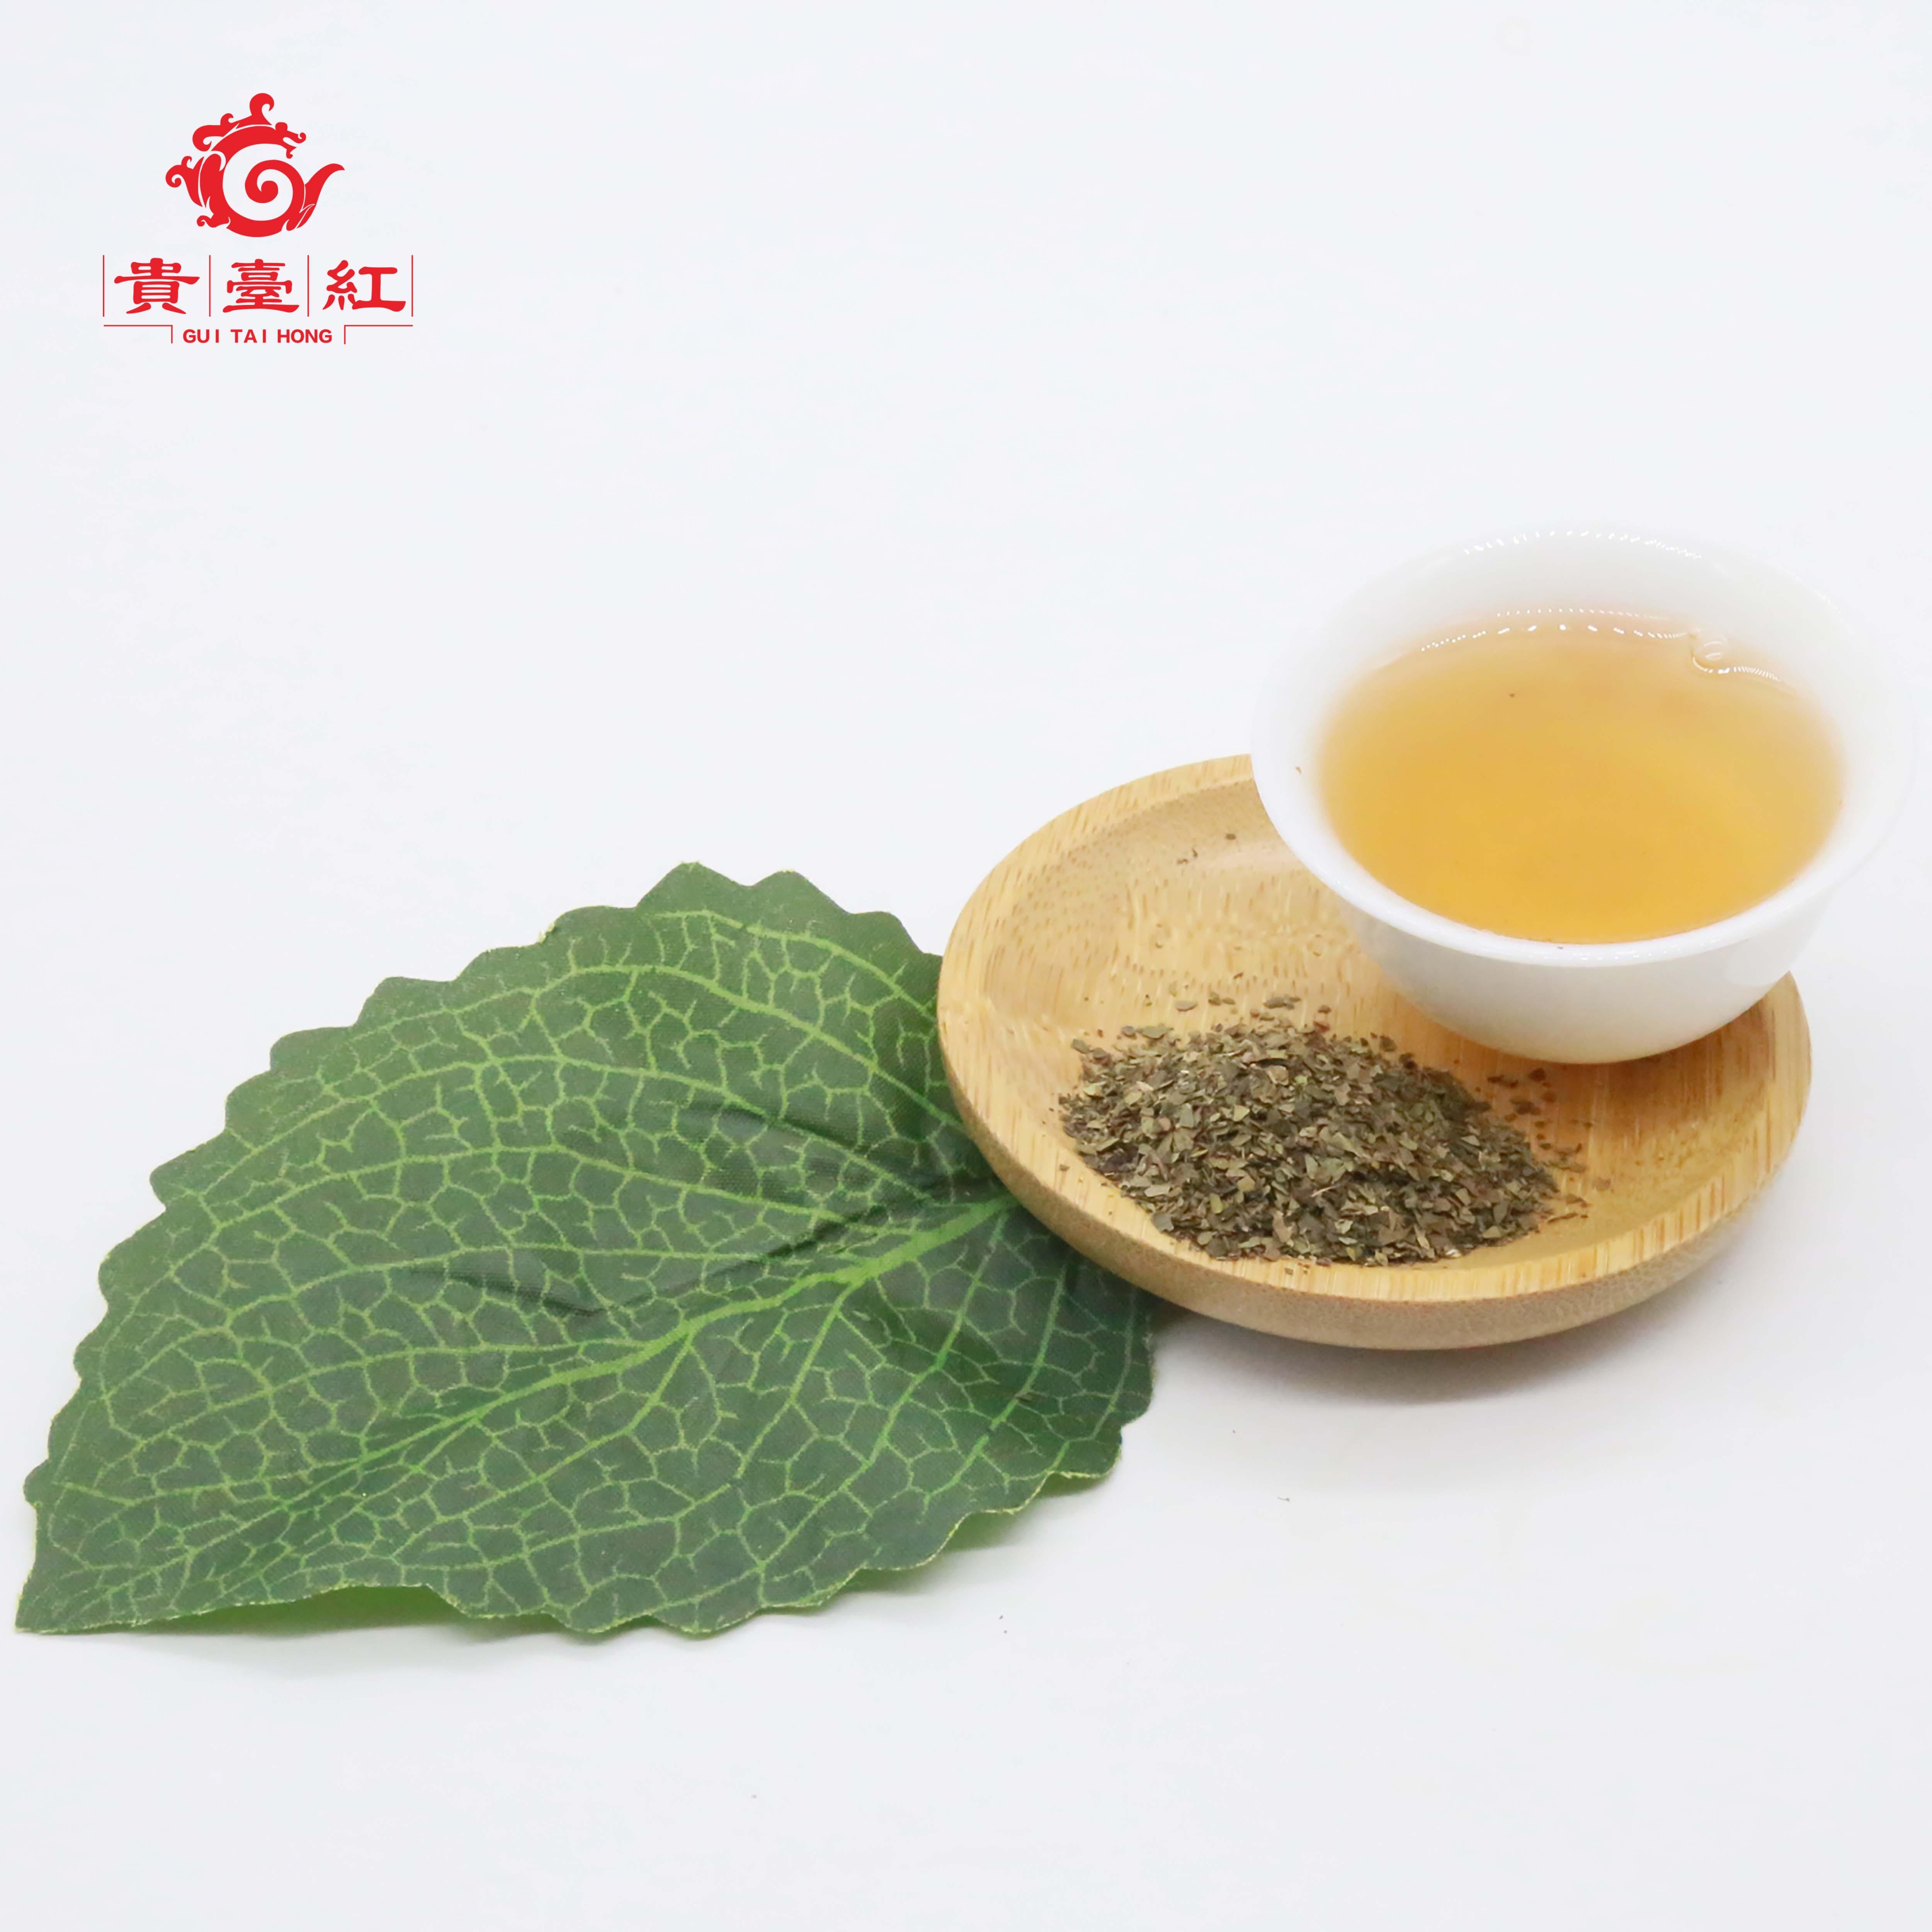 white tea for sale cheap prices fuding white tea powder tea slices organic and healthy drink - 4uTea   4uTea.com